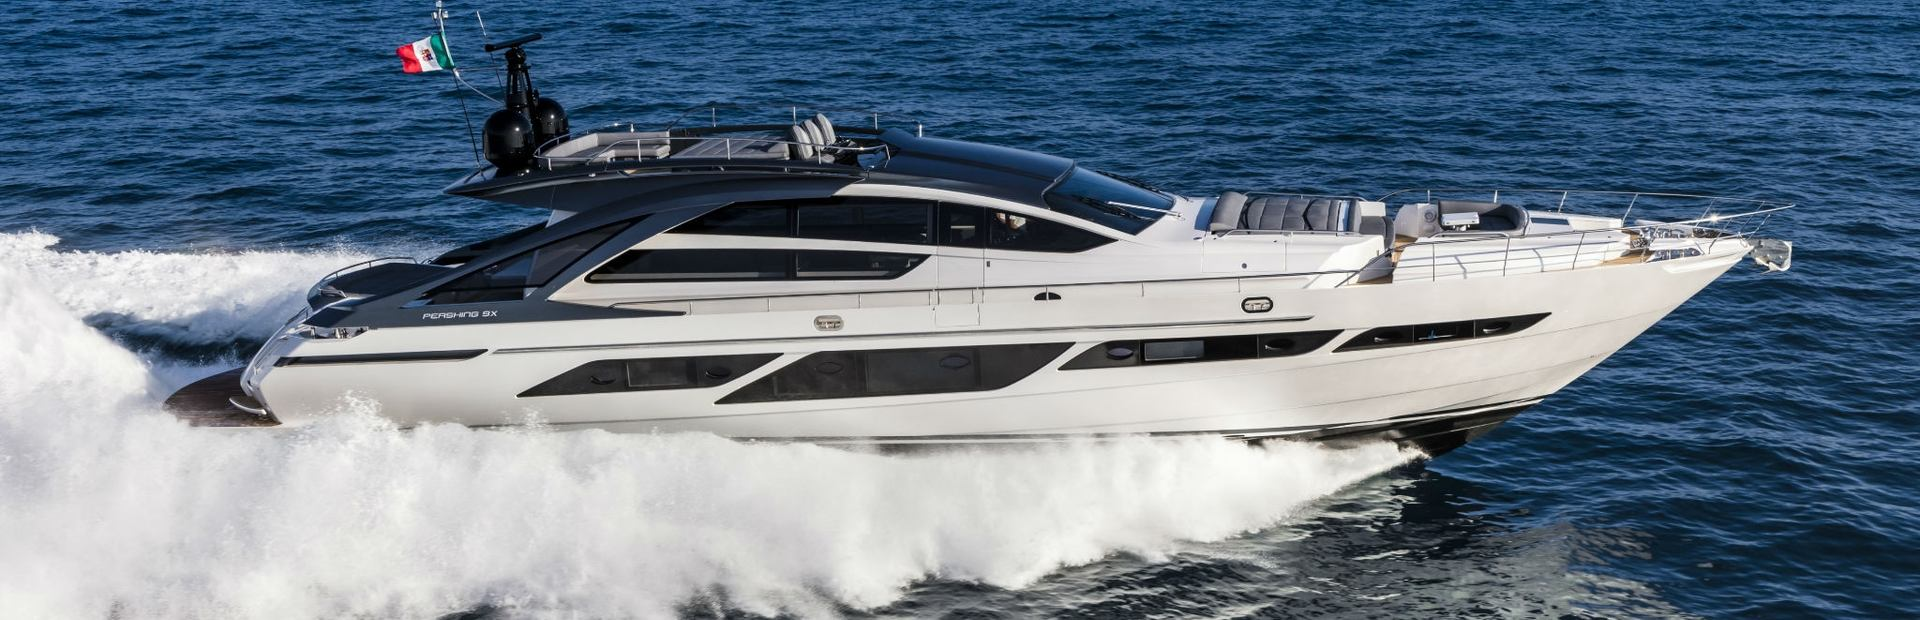 Pershing 9X Yacht Charter